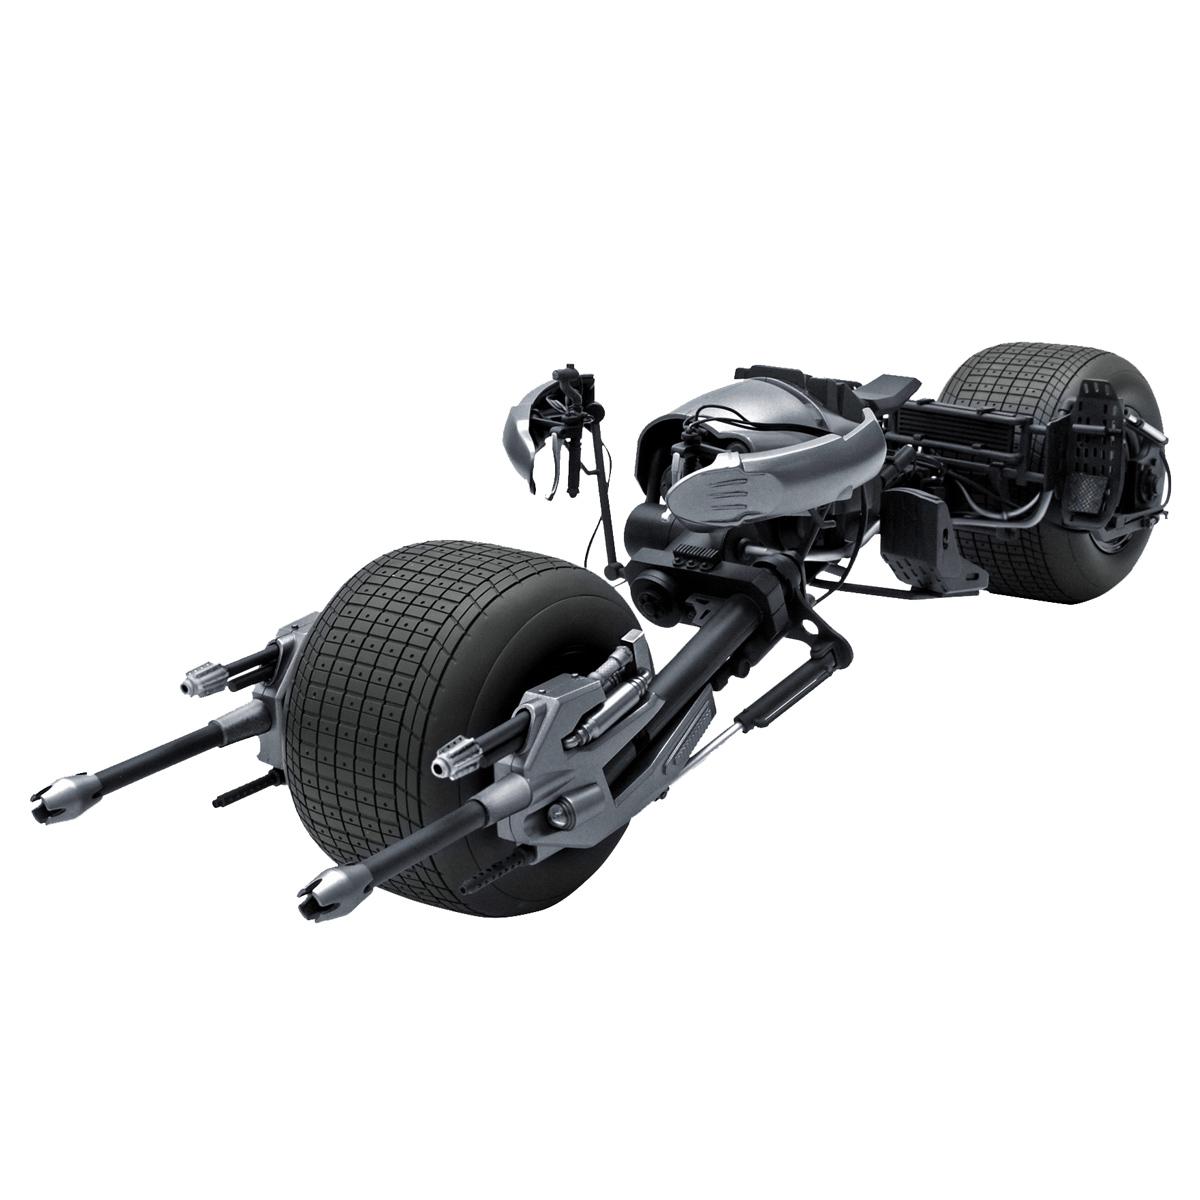 Miniatura Bat-pod The Dark Knight Hot Wheels Elite 1:18